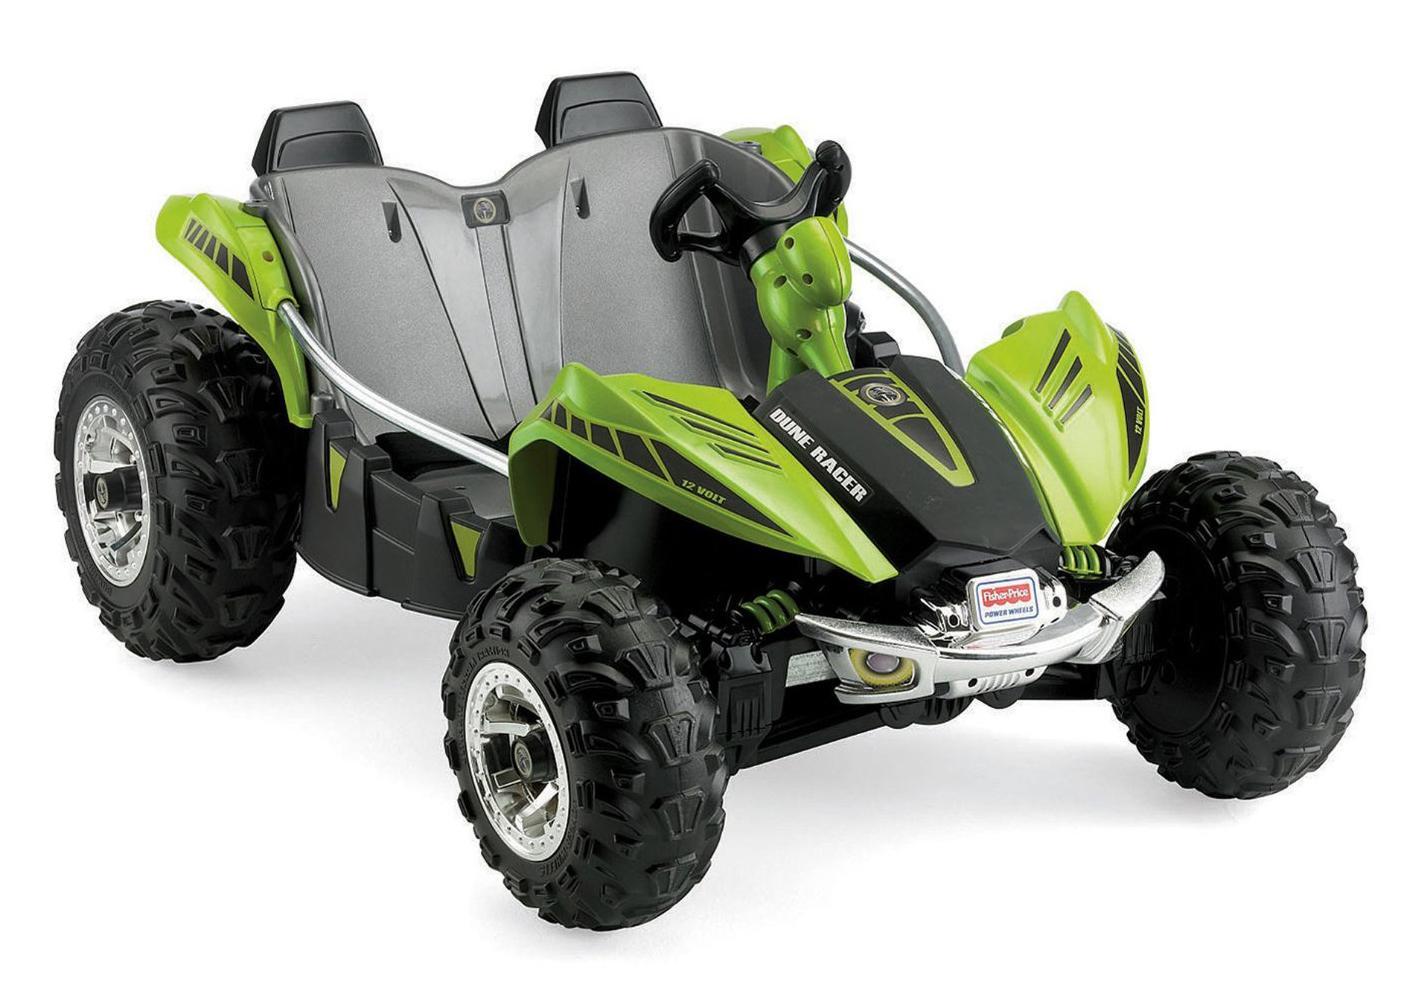 Amazon.com: Power Wheels Dune Racer, Green: Toys & Games